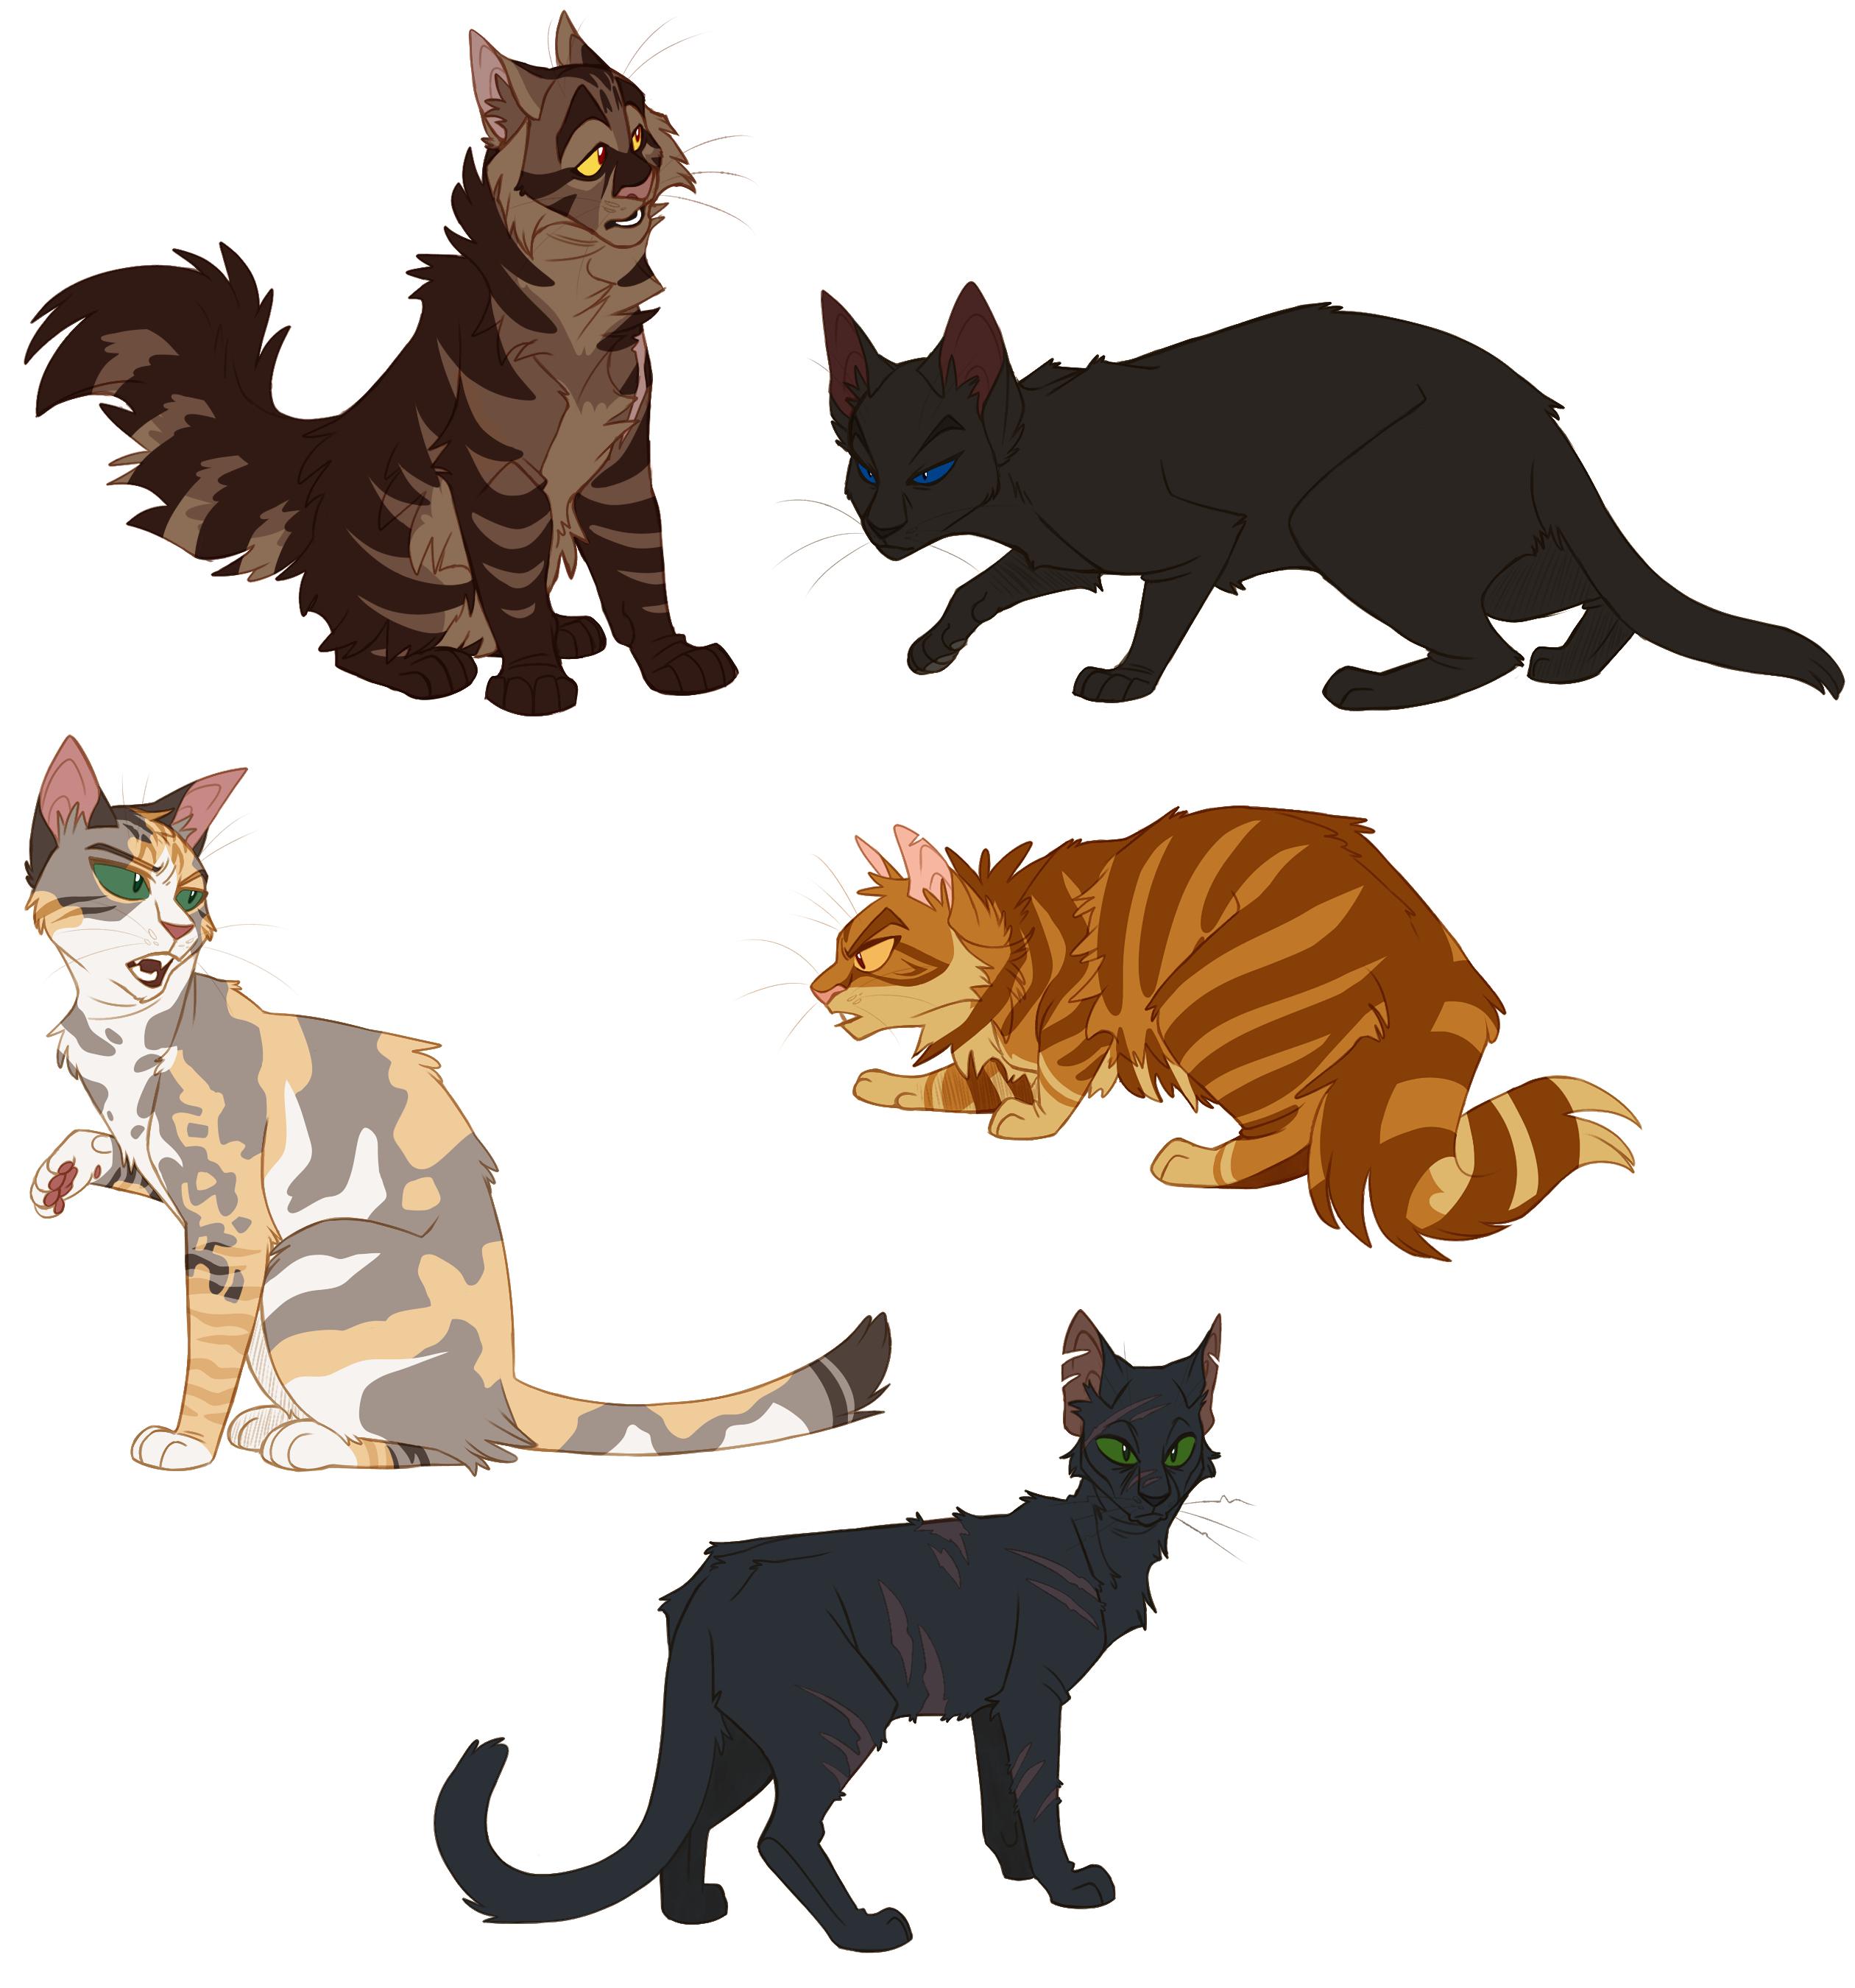 Warriors Into The Wild Dra Level: 100 Warrior Cats Challenge: Days 21-25